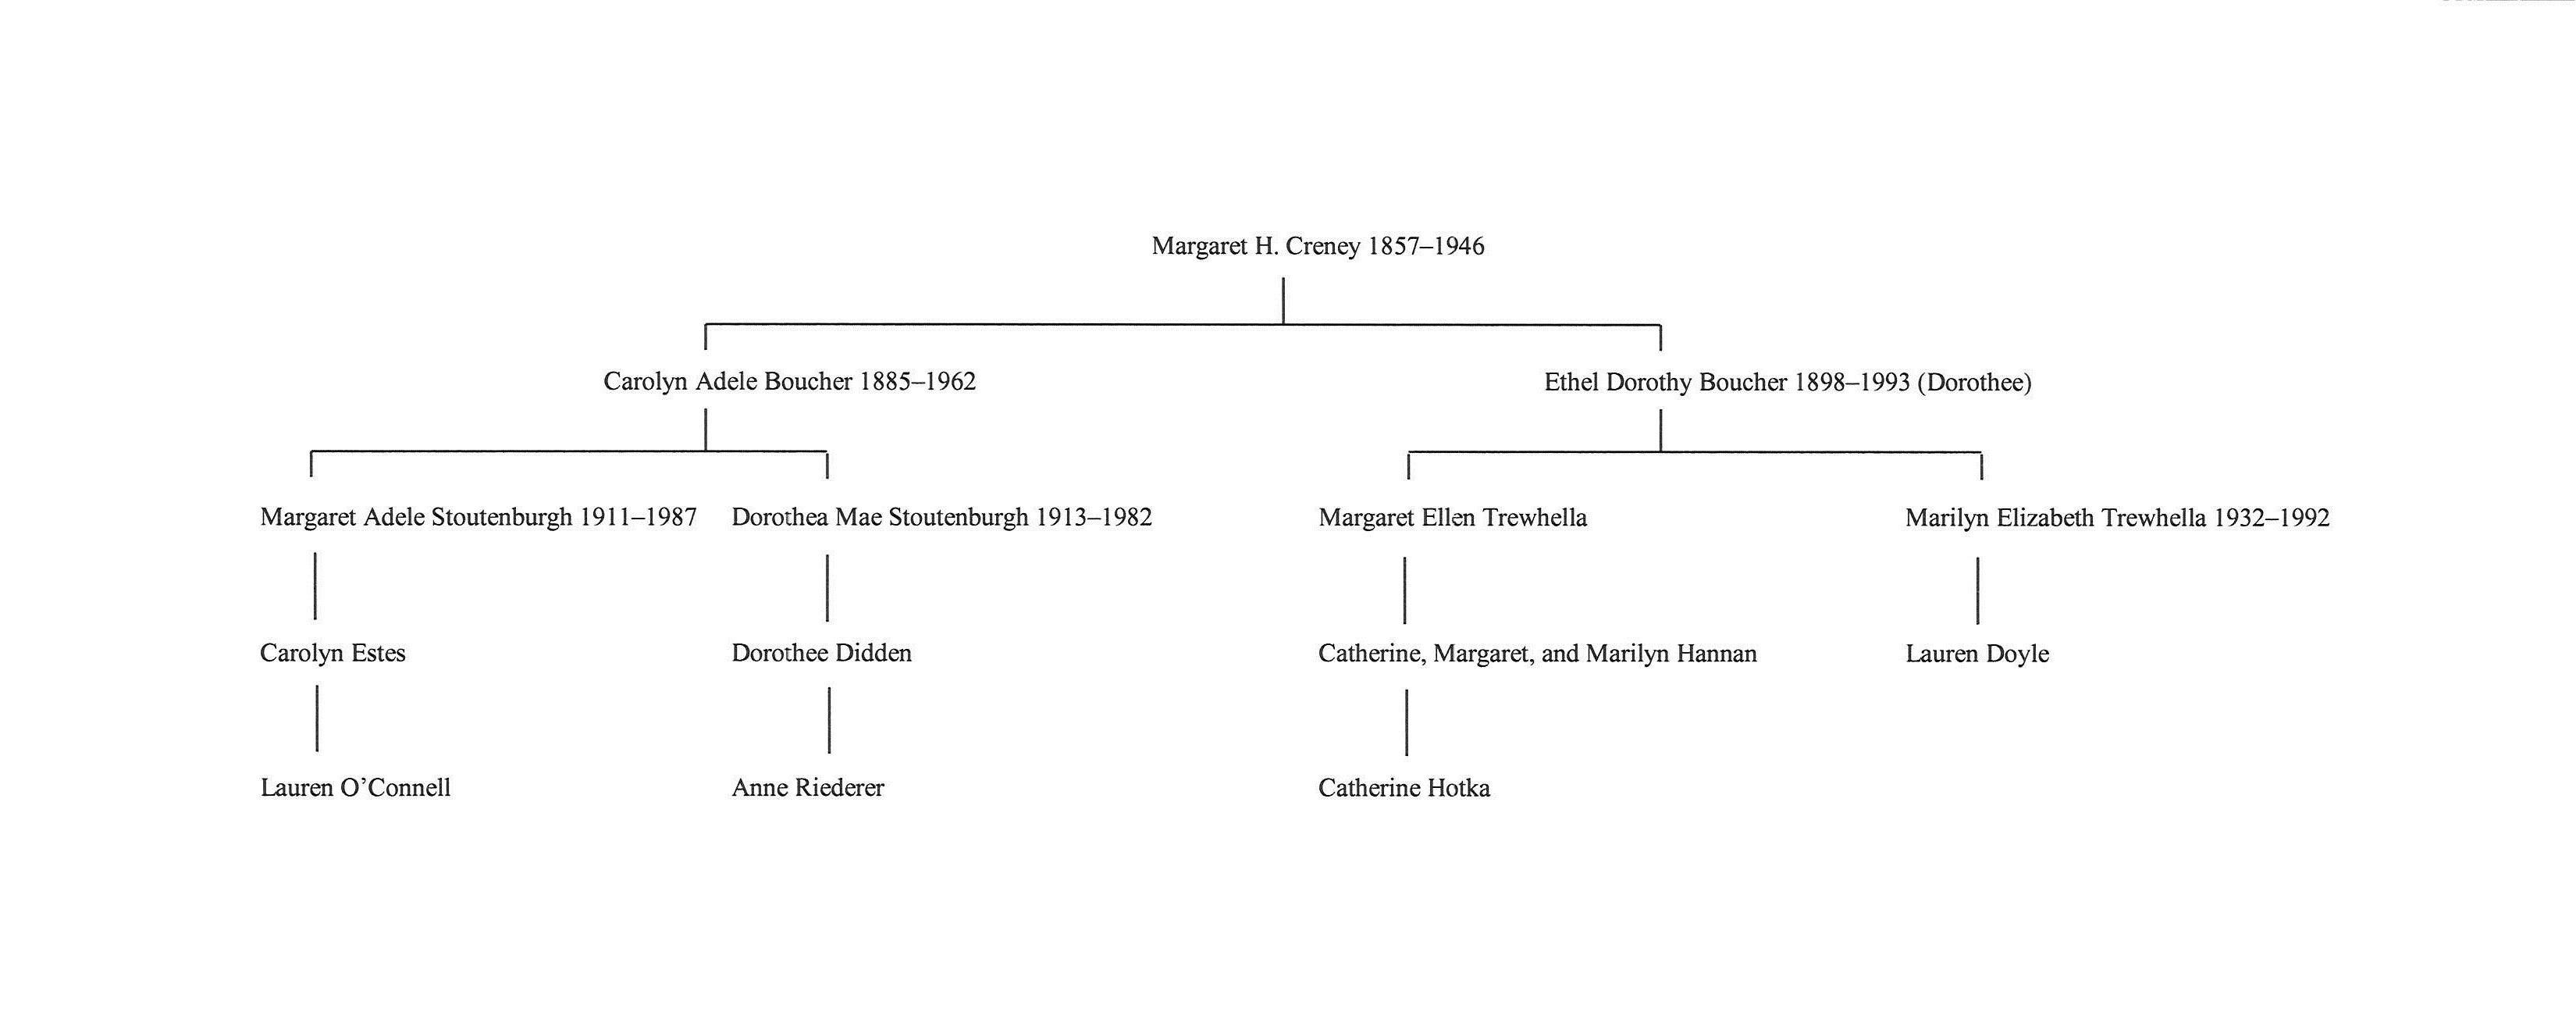 Margaret Boucher matrilineage